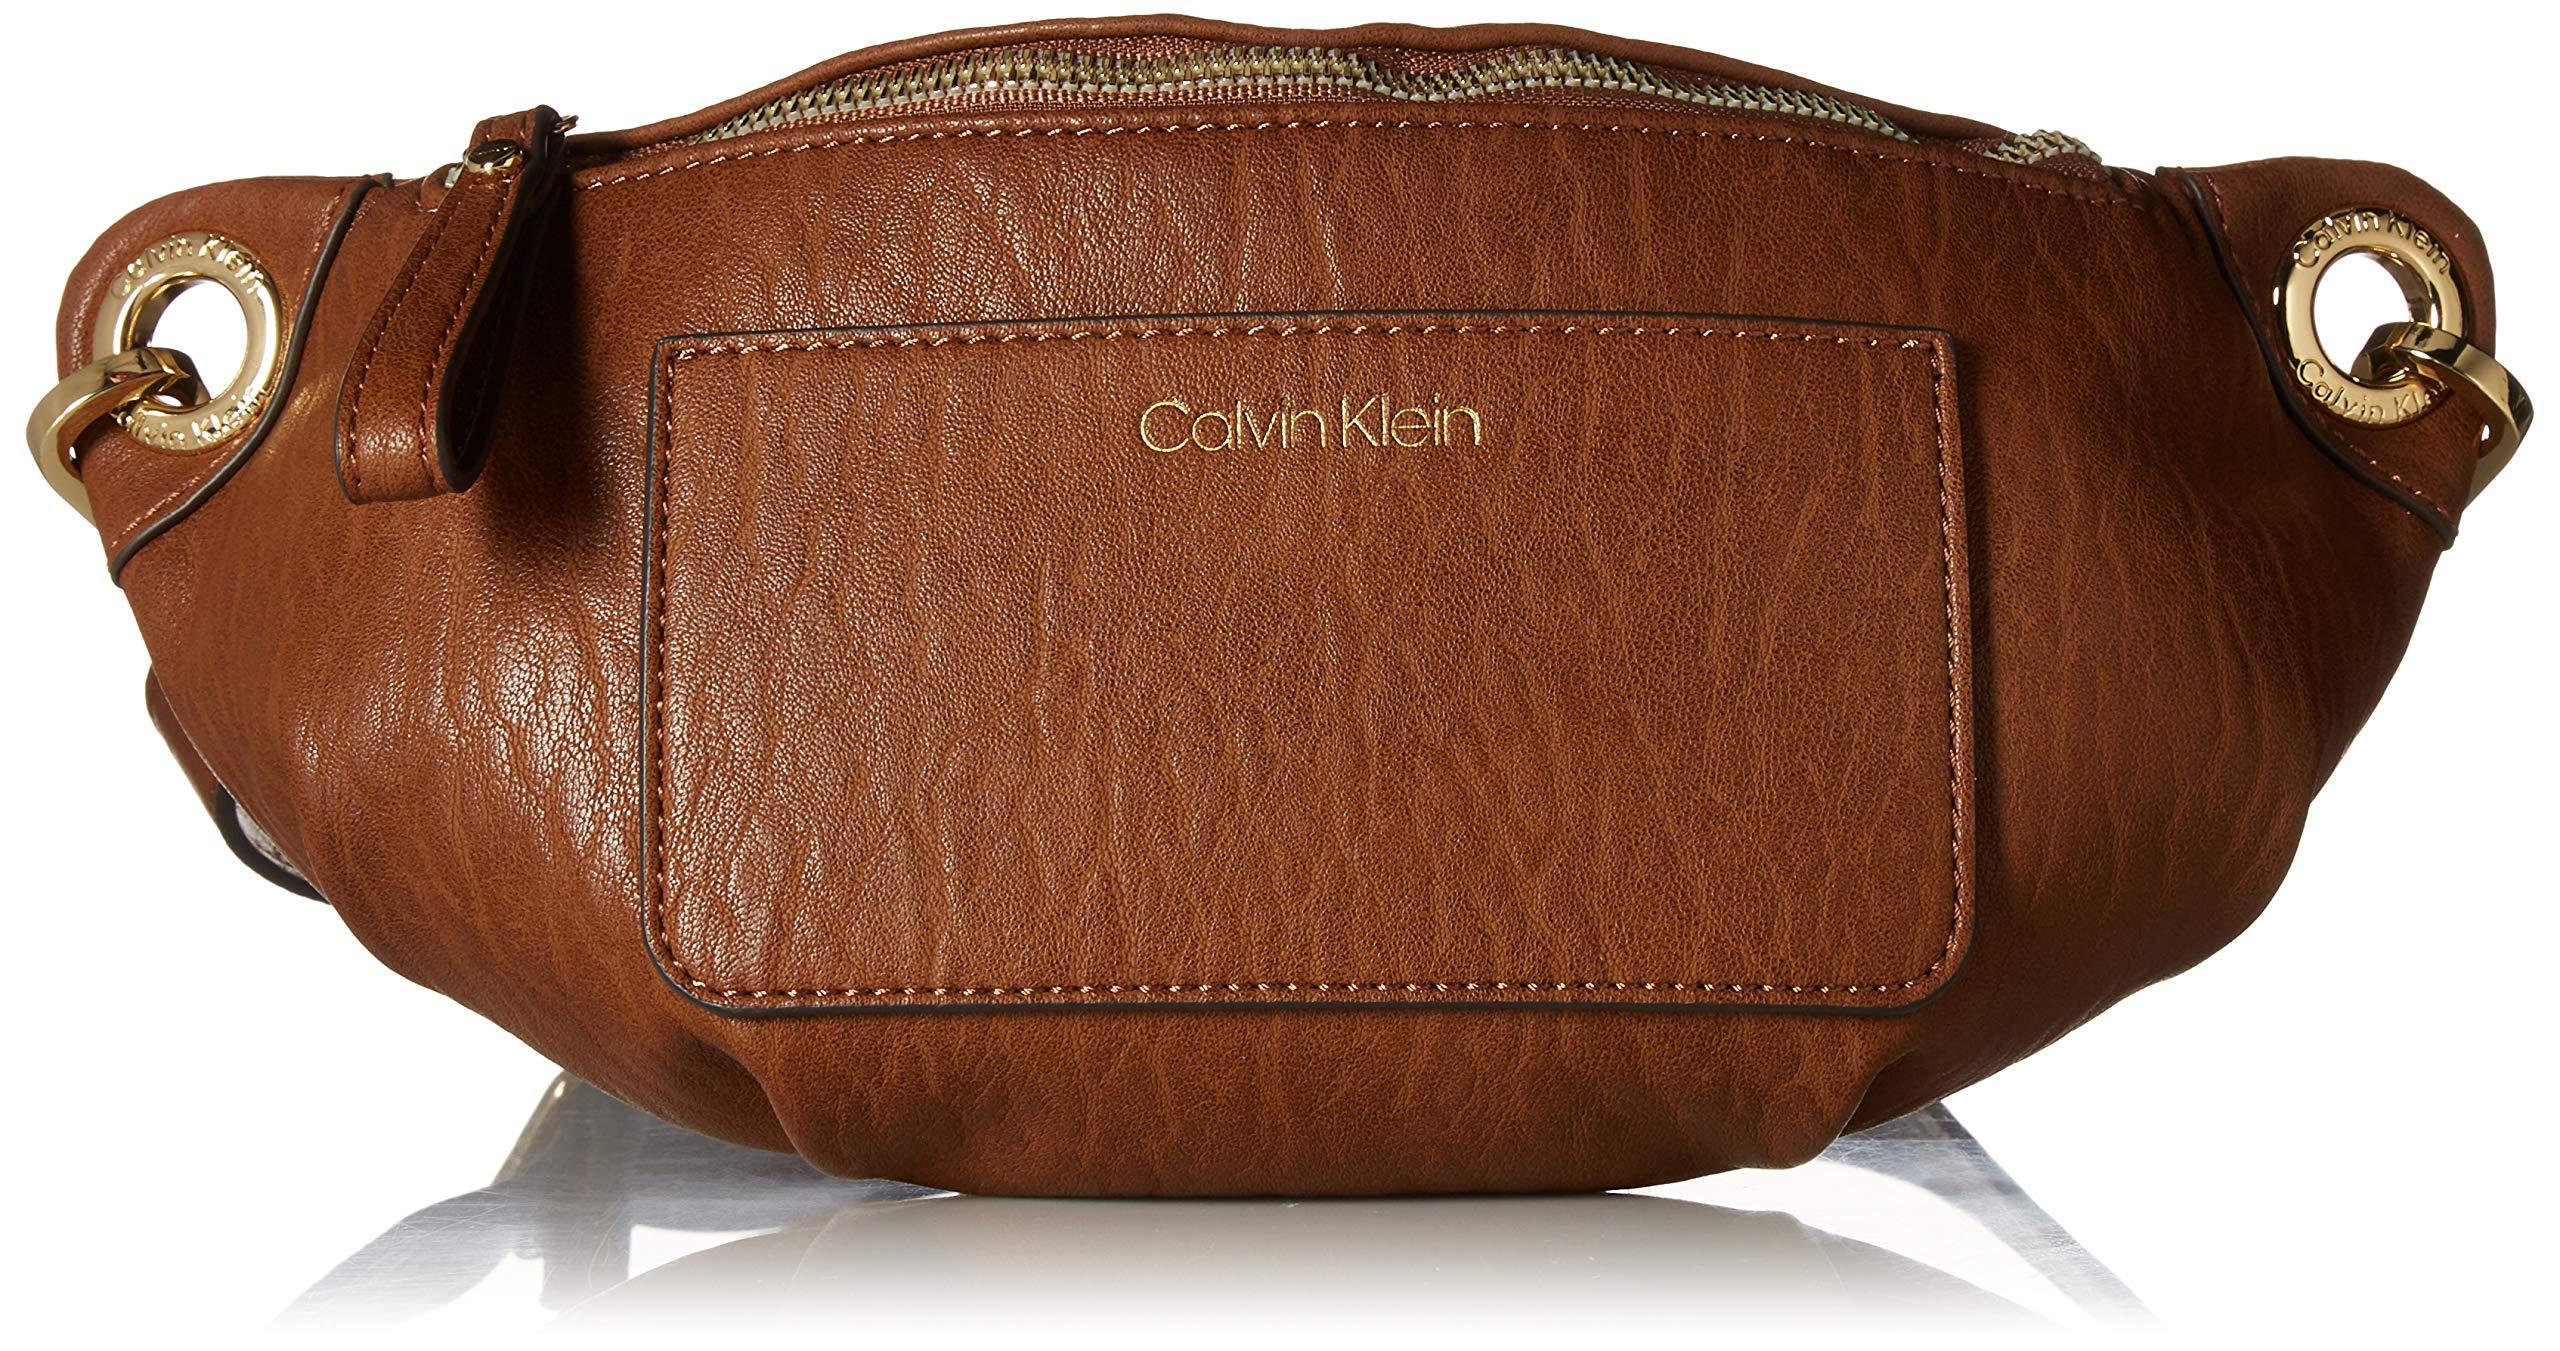 Calvin Klein Sonoma Bubble Lamb Novelty Key Item Fanny Pack Belt Bag, Luggage